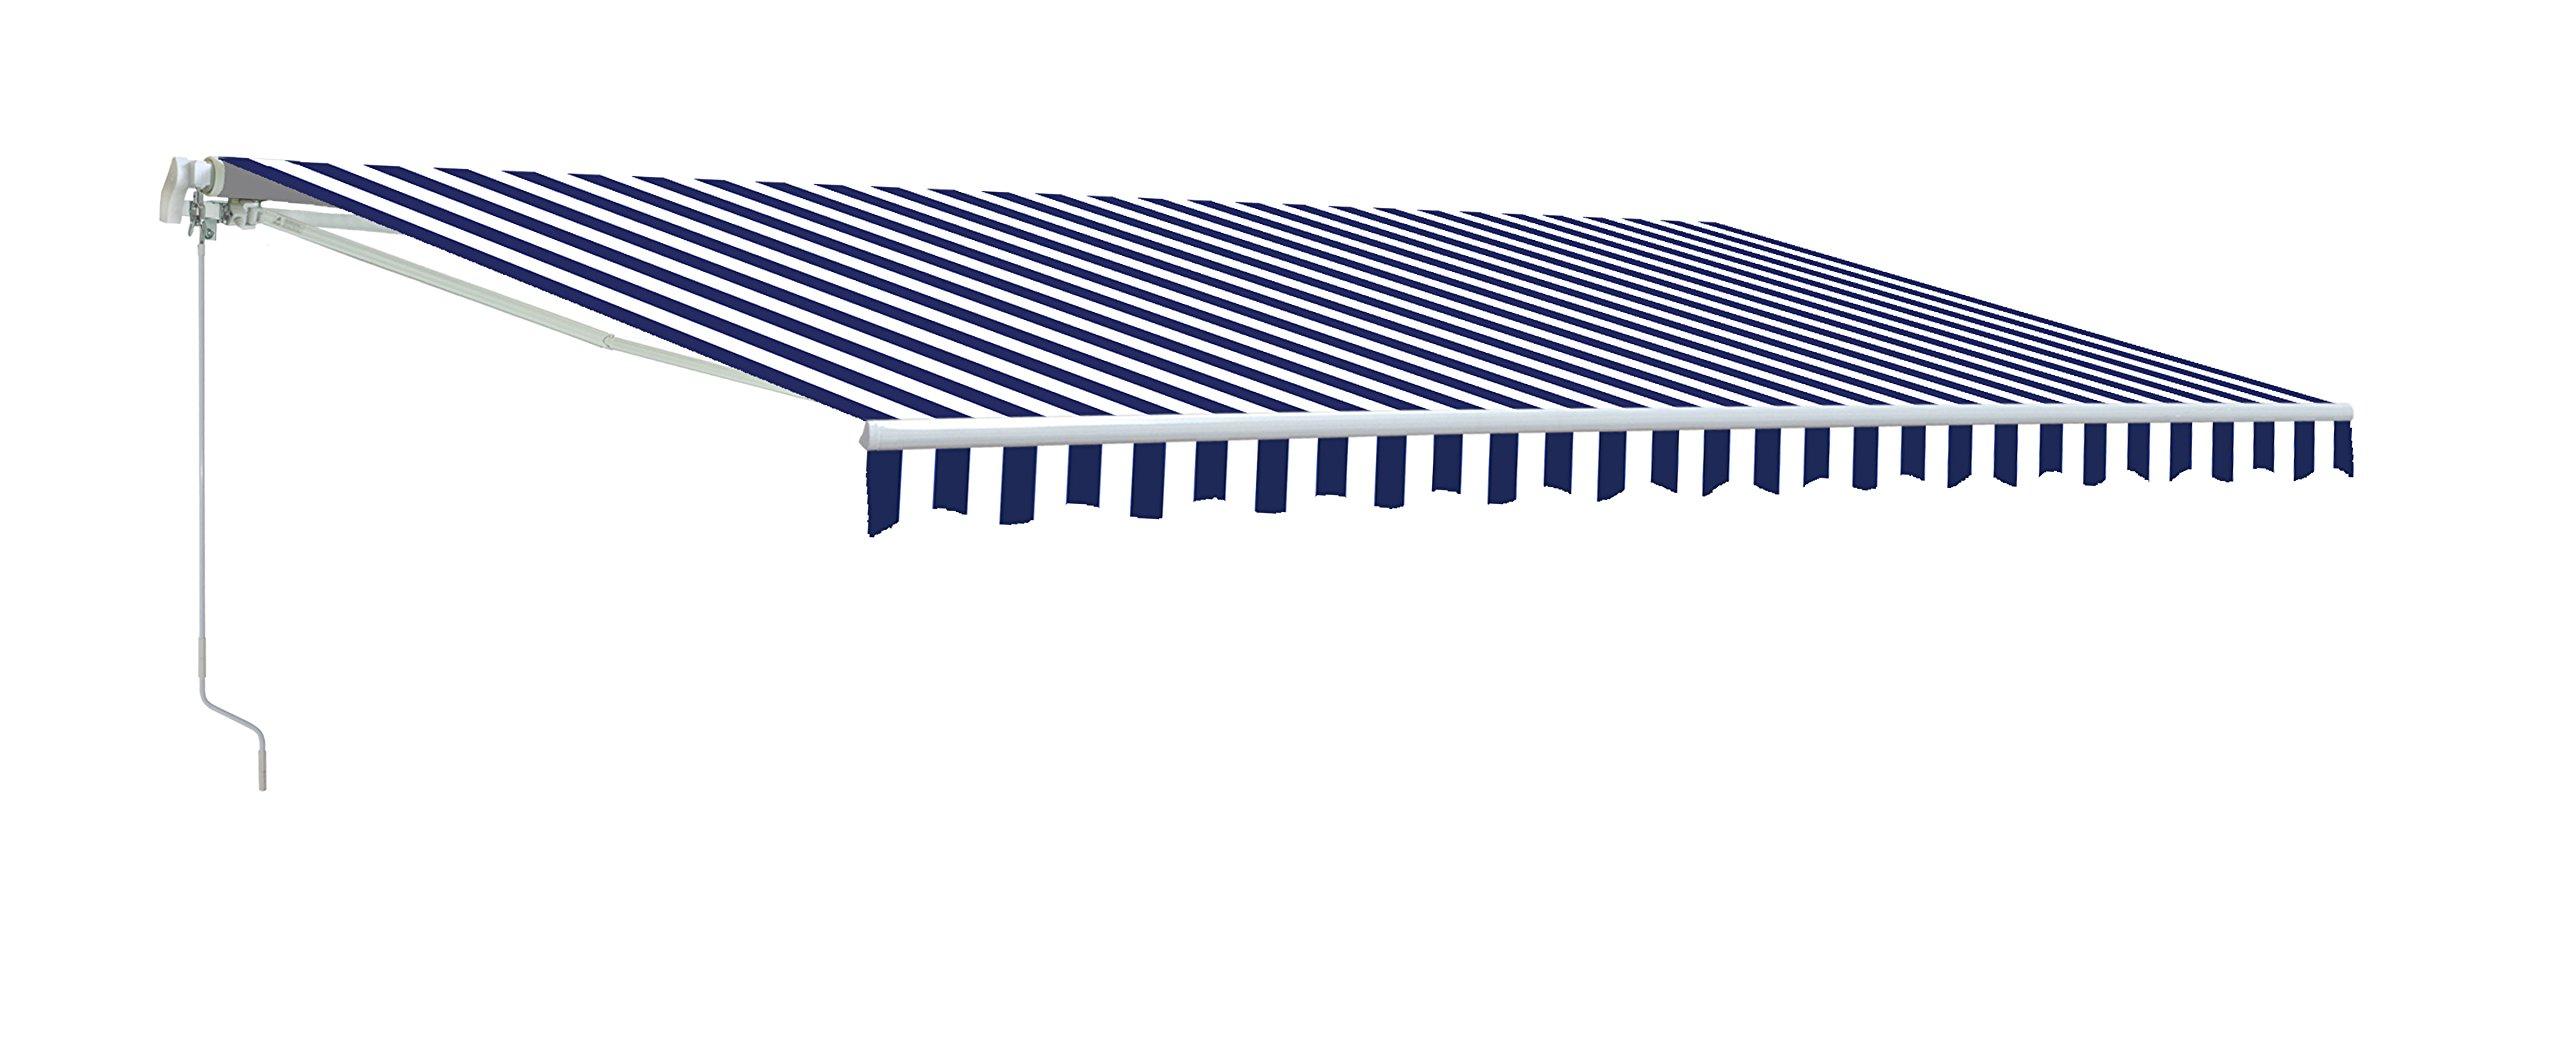 Aleko AW13X10BWSTR03  13X10-Feet Retractable Awning, Blue/White Strap